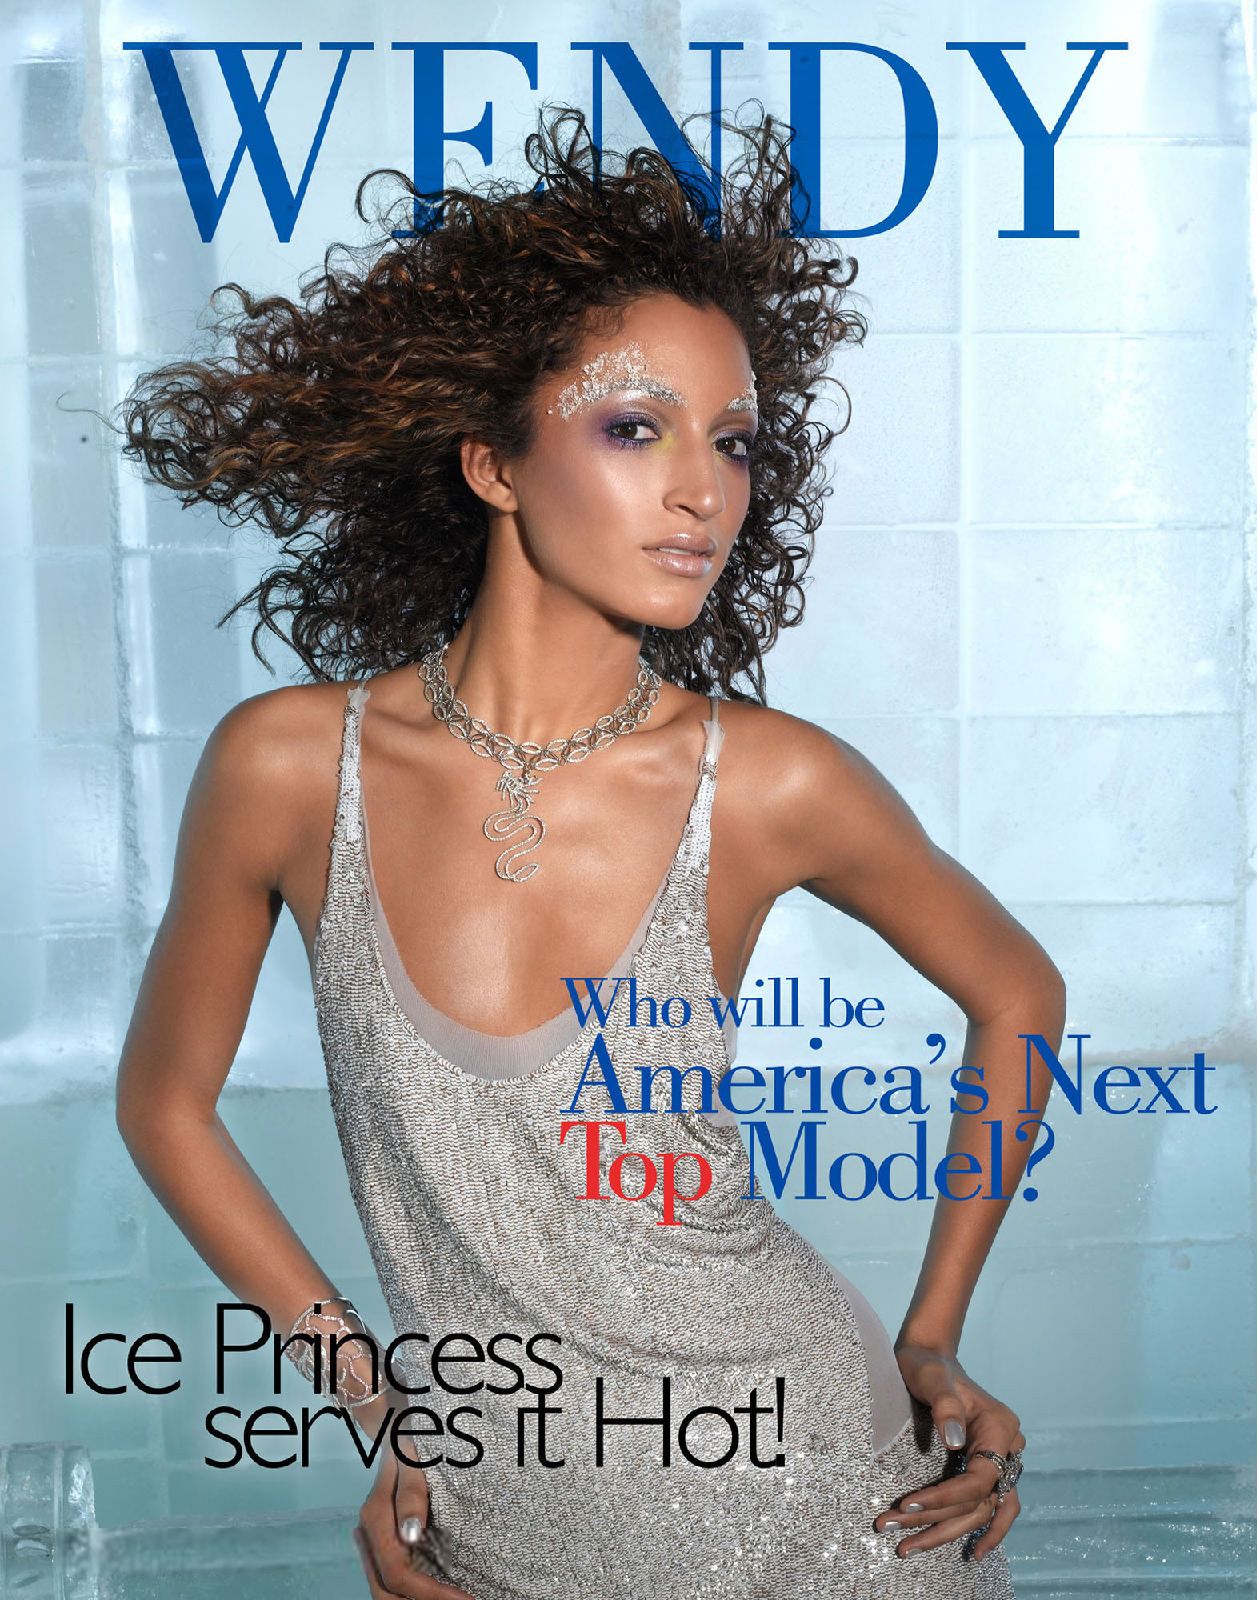 next top model blog antm c6 ice princess magazine covers. Black Bedroom Furniture Sets. Home Design Ideas